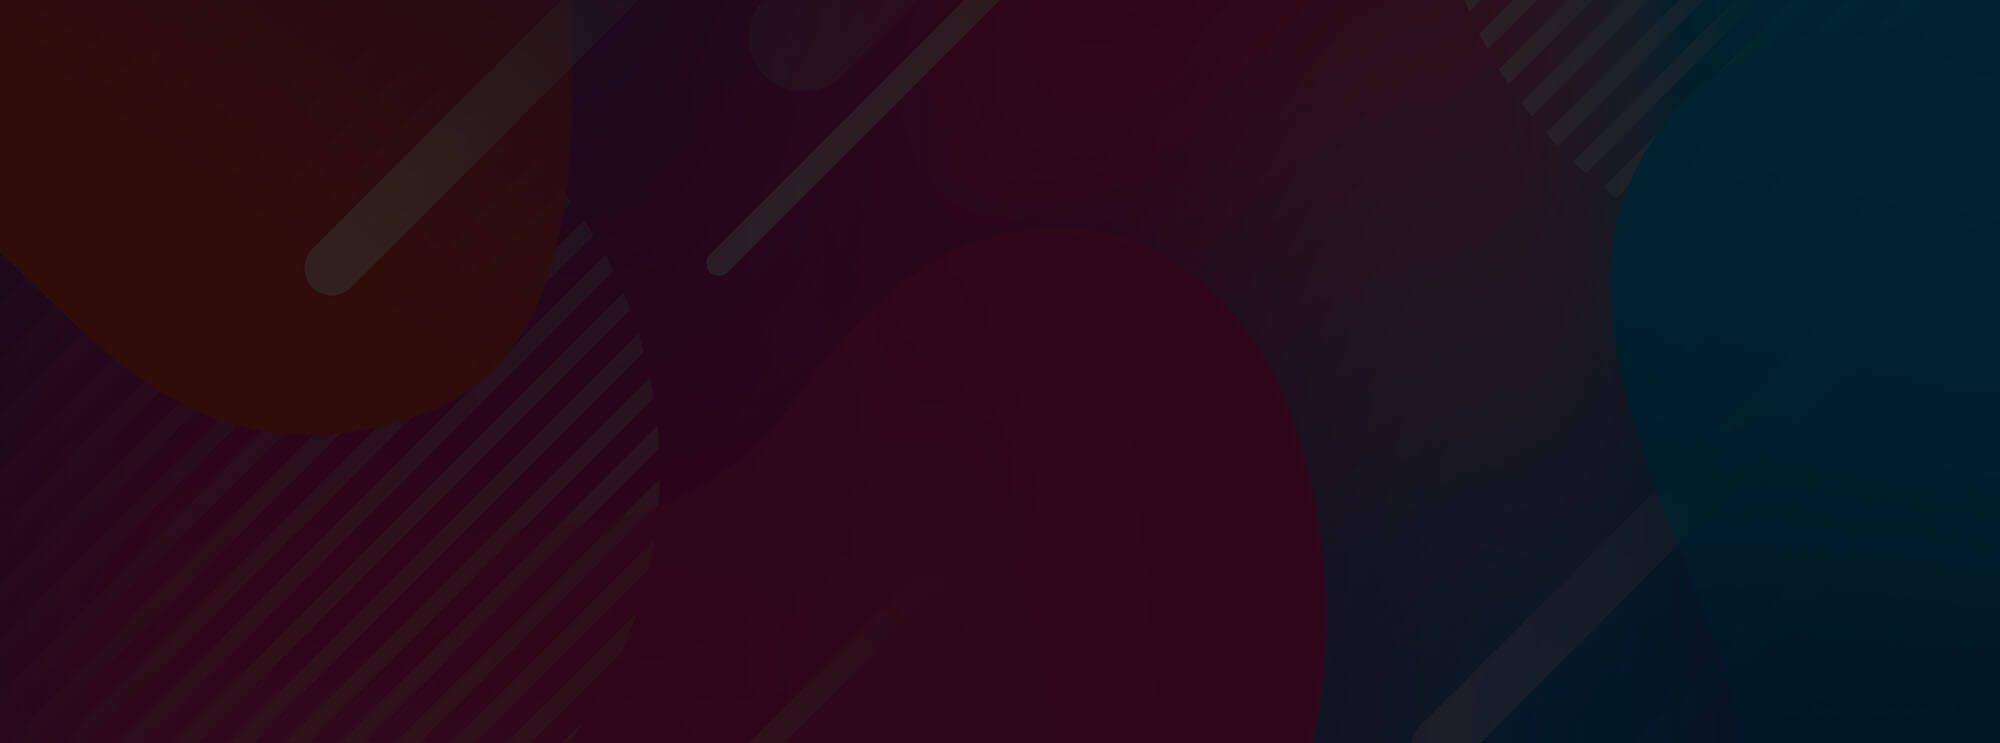 80% Off | Titan EDM Bundle